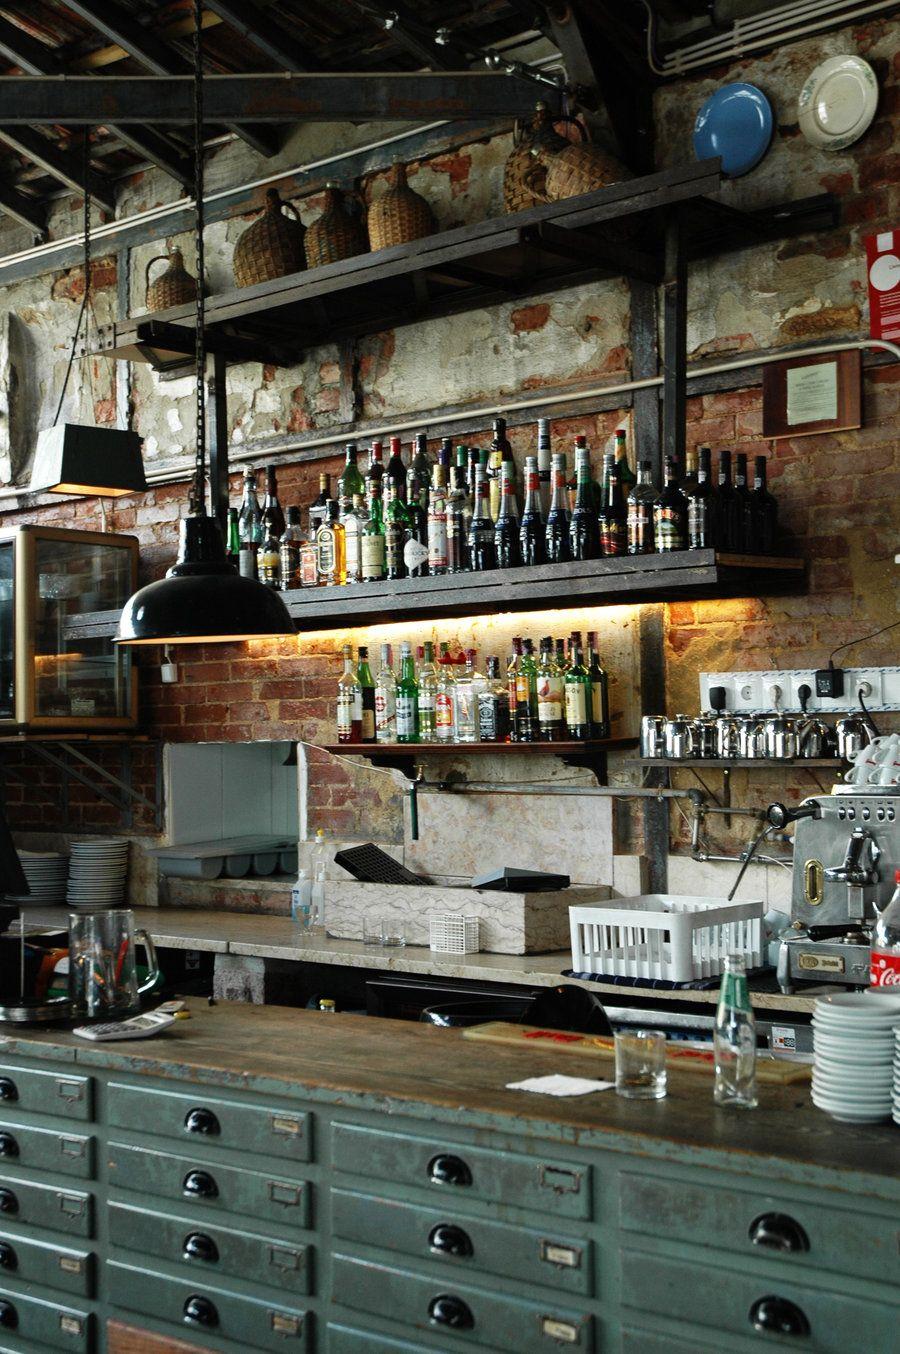 pin by erika van der westhuizen on coffee shop pinterest einrichtung haus and caf. Black Bedroom Furniture Sets. Home Design Ideas